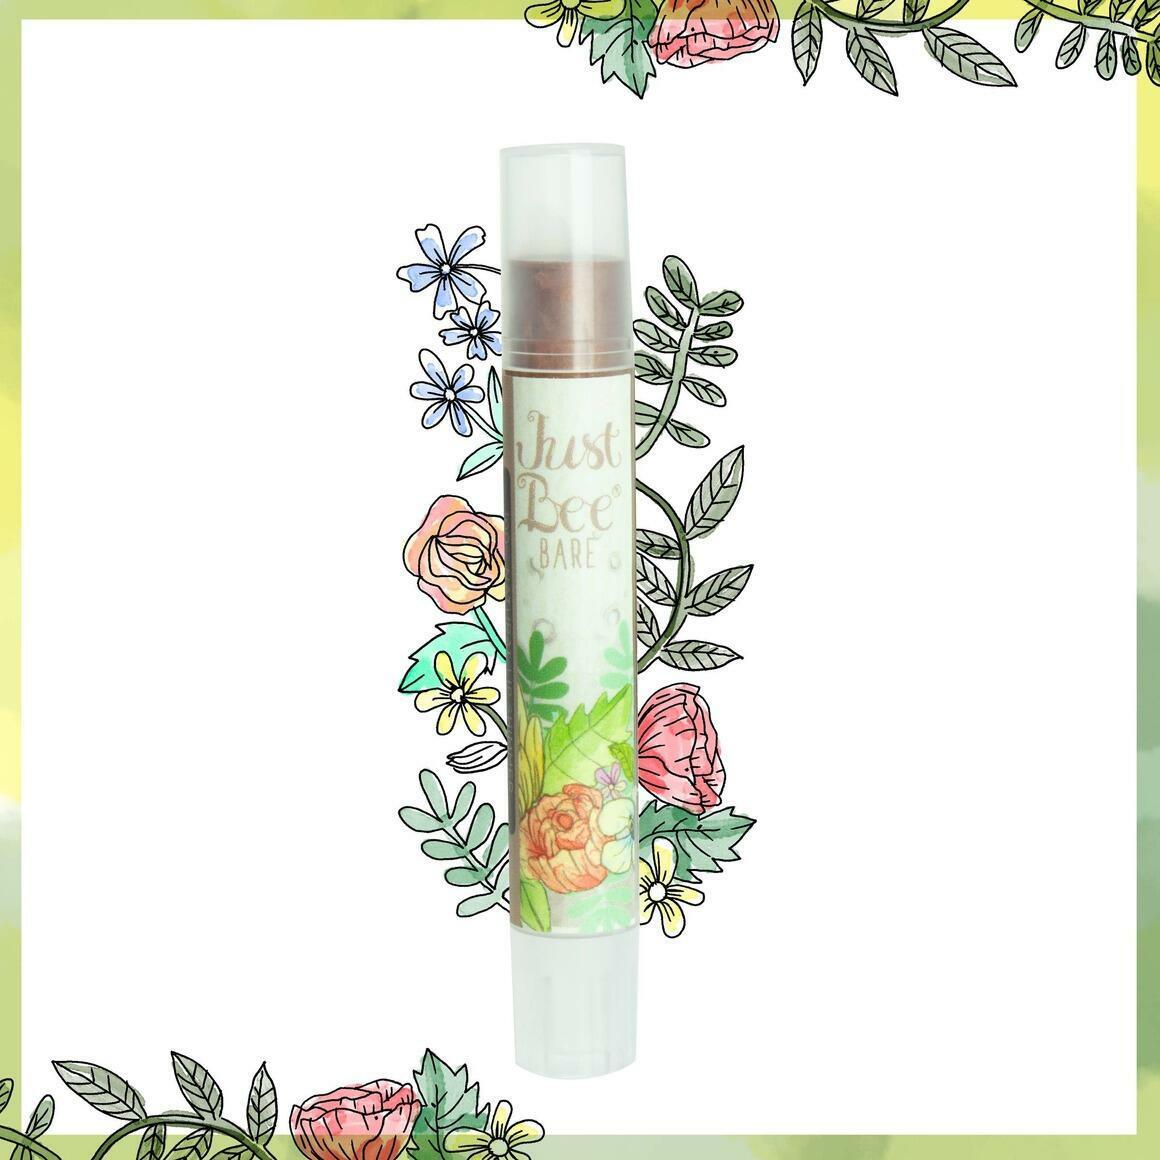 Just Bee Bare - Lip Shimmer - Refill | Trada Marketplace